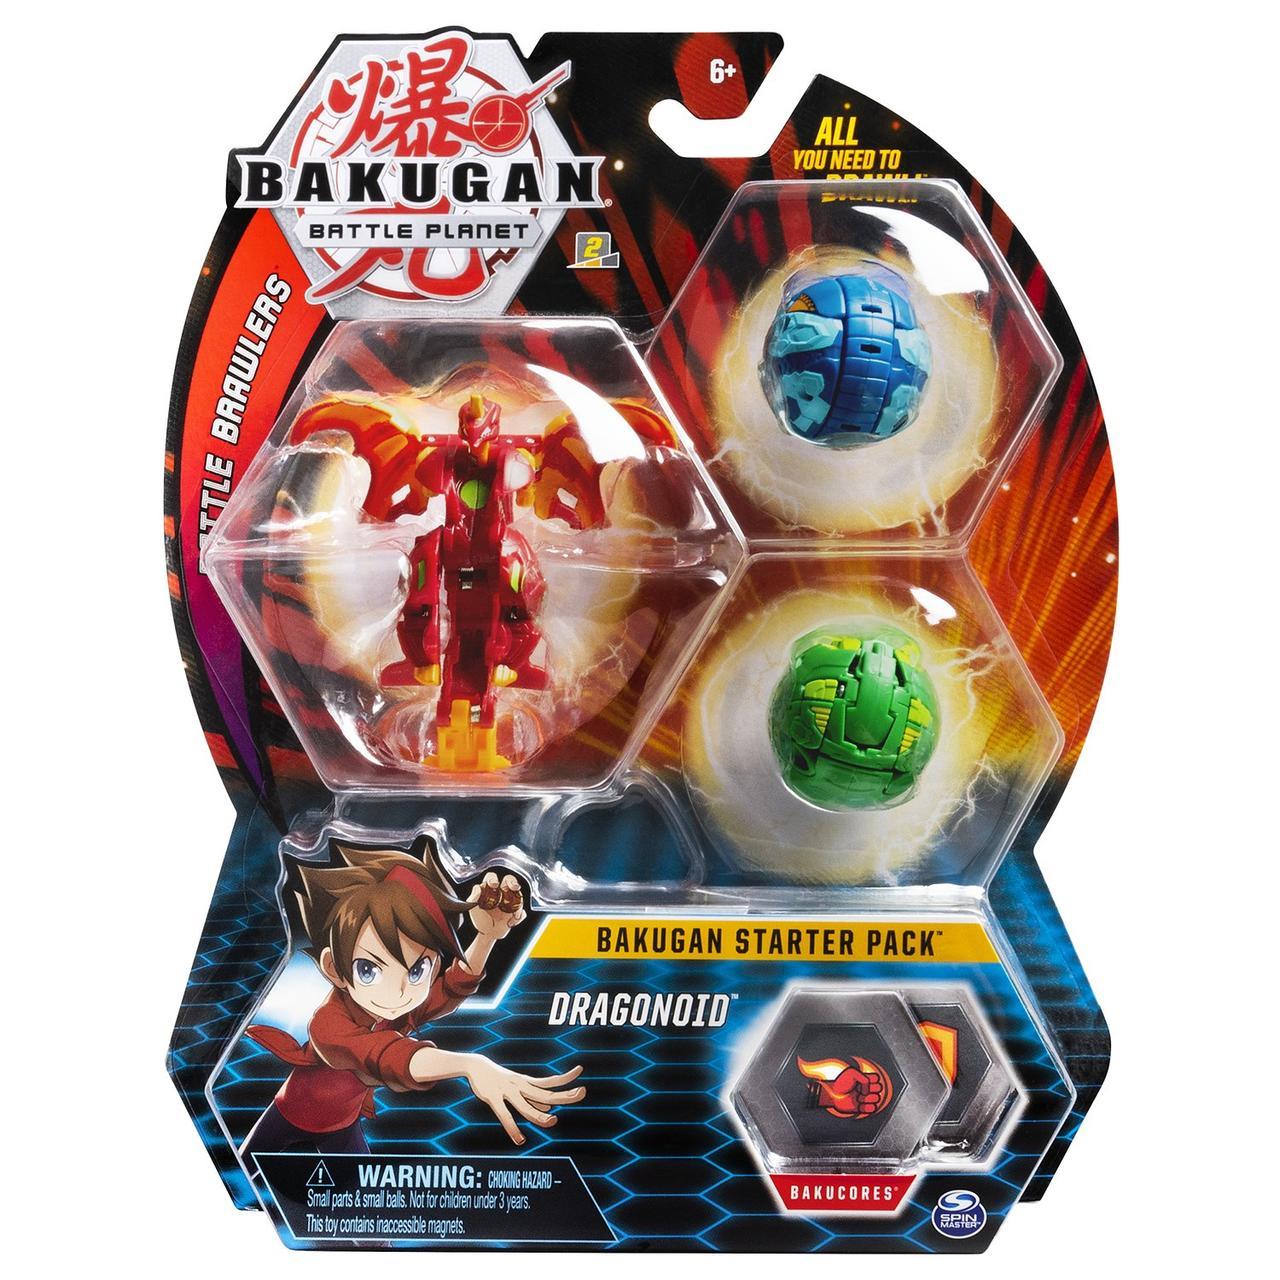 Bakugan Стартовый игровой набор Бакуган №13 Драгоноид (Dragonoid)